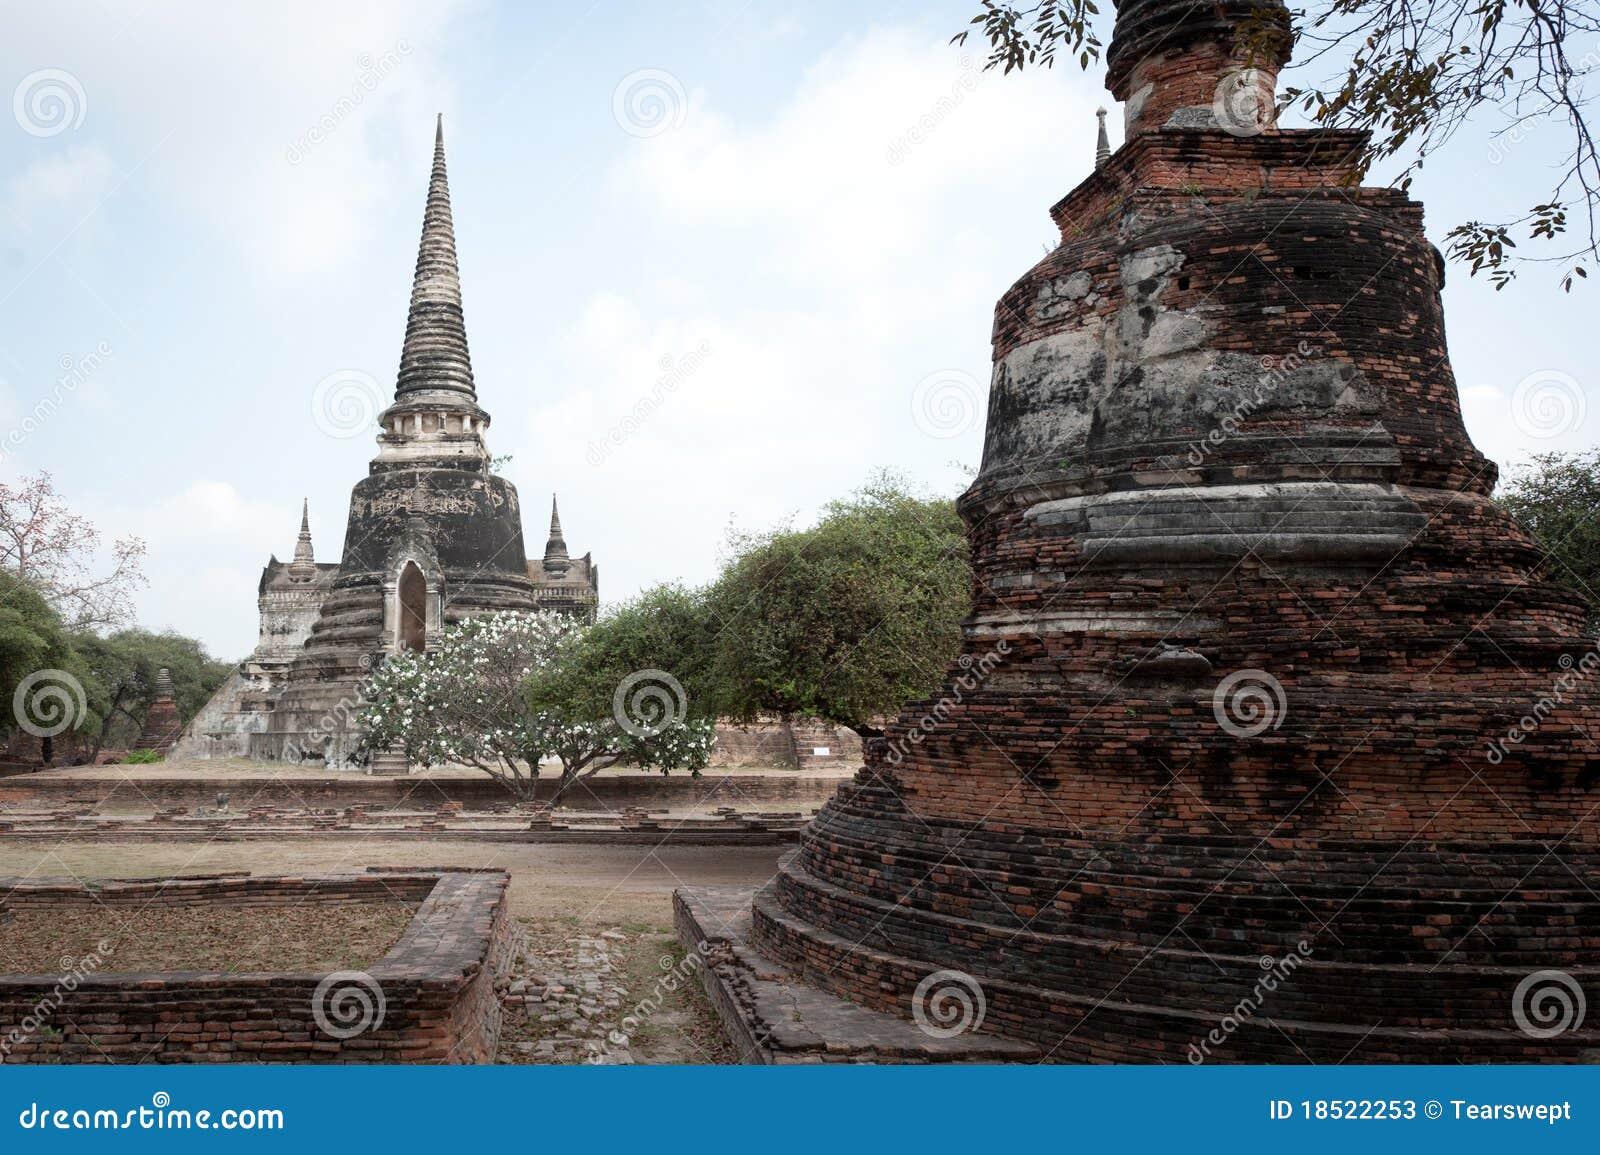 Wat Phra Si Sanphet Stock Photos - Image: 18522253